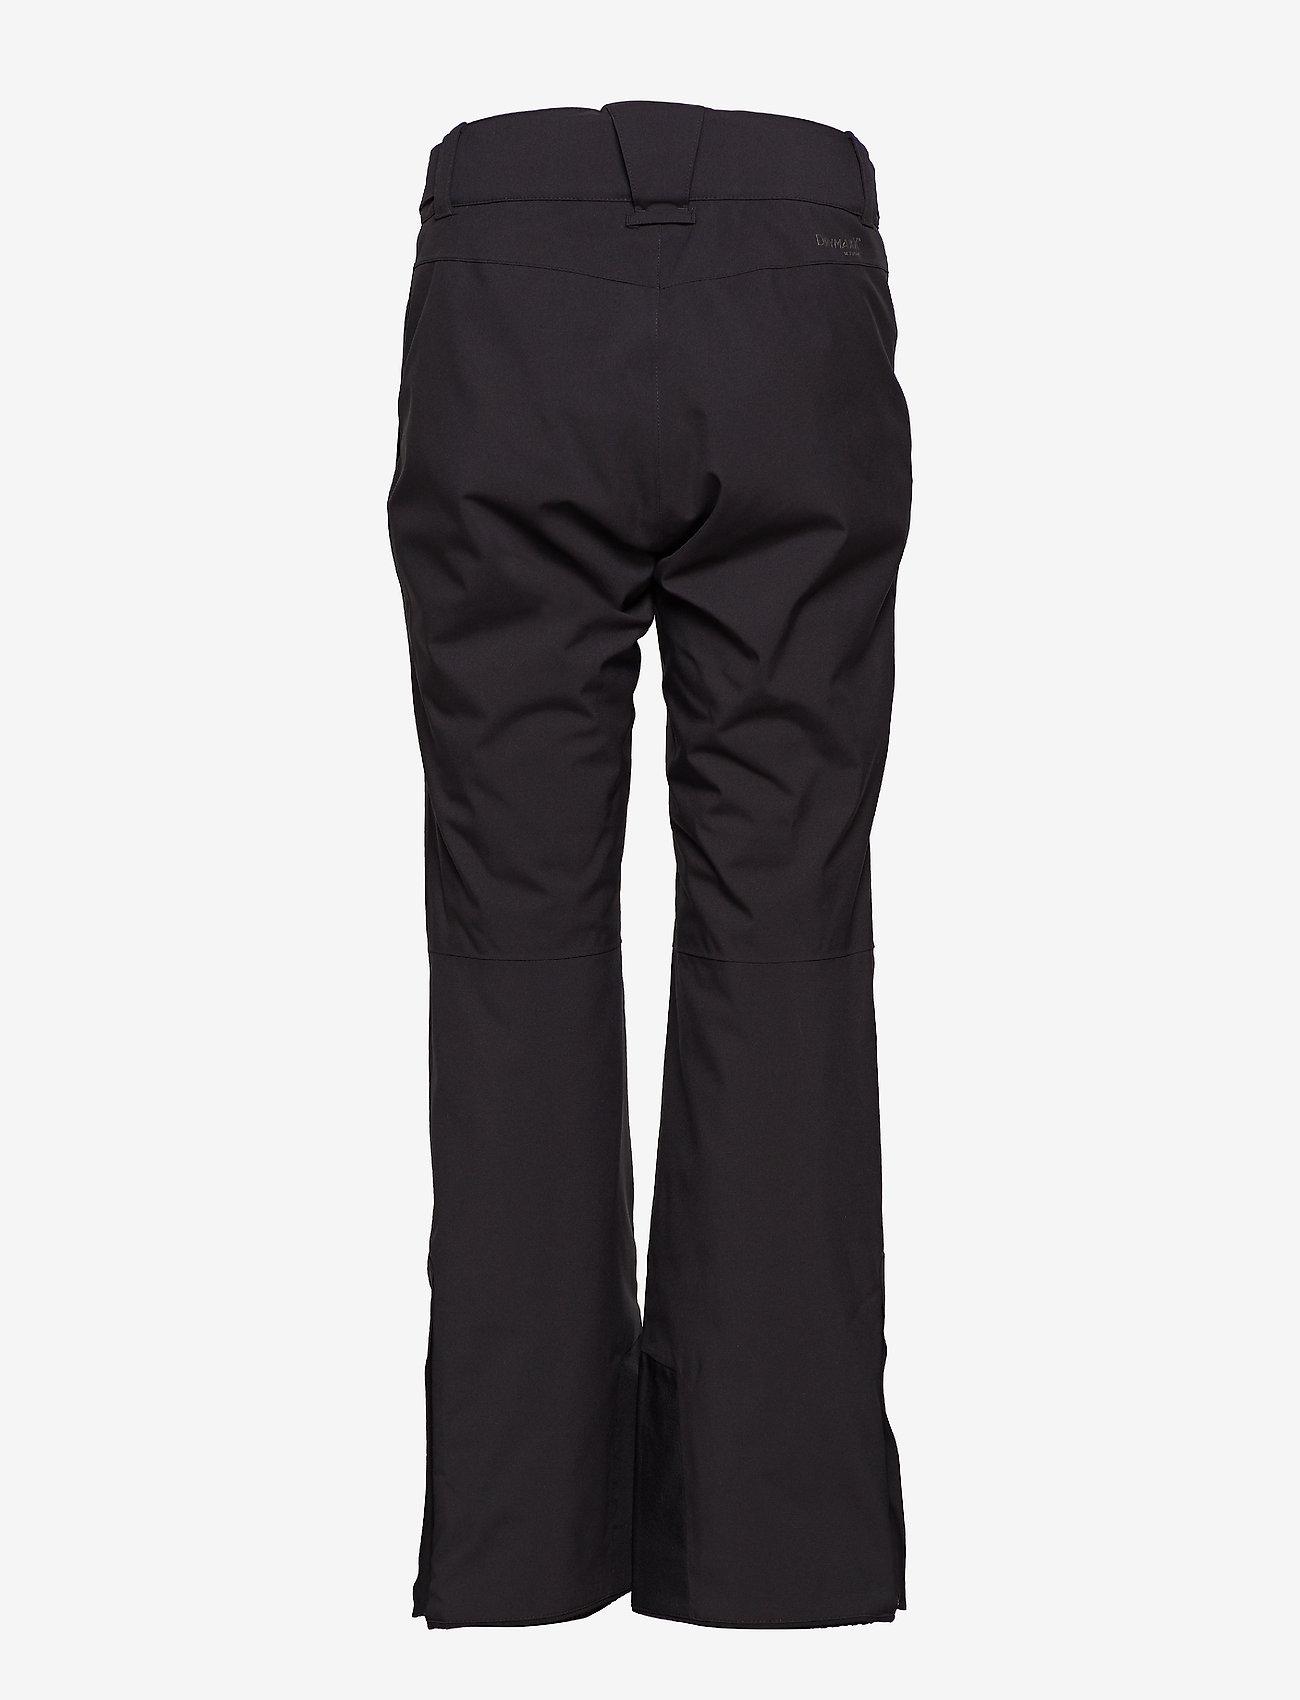 Halti - Puntti II W DX ski pants - insulated pants - black - 1